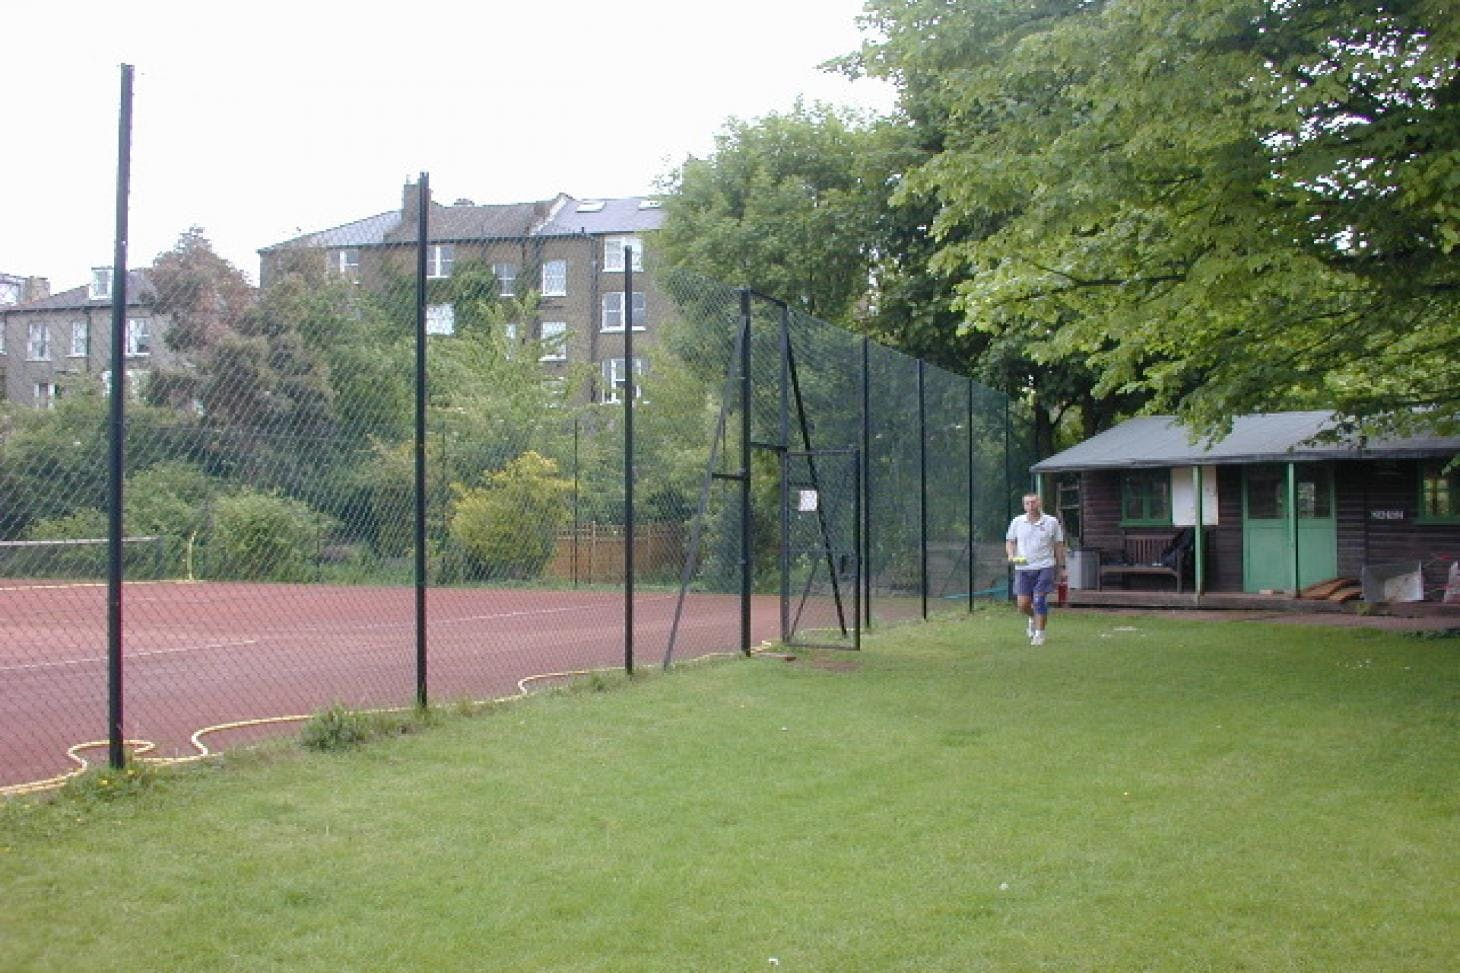 Kenlyn Lawn Tennis Club Outdoor | Clay tennis court